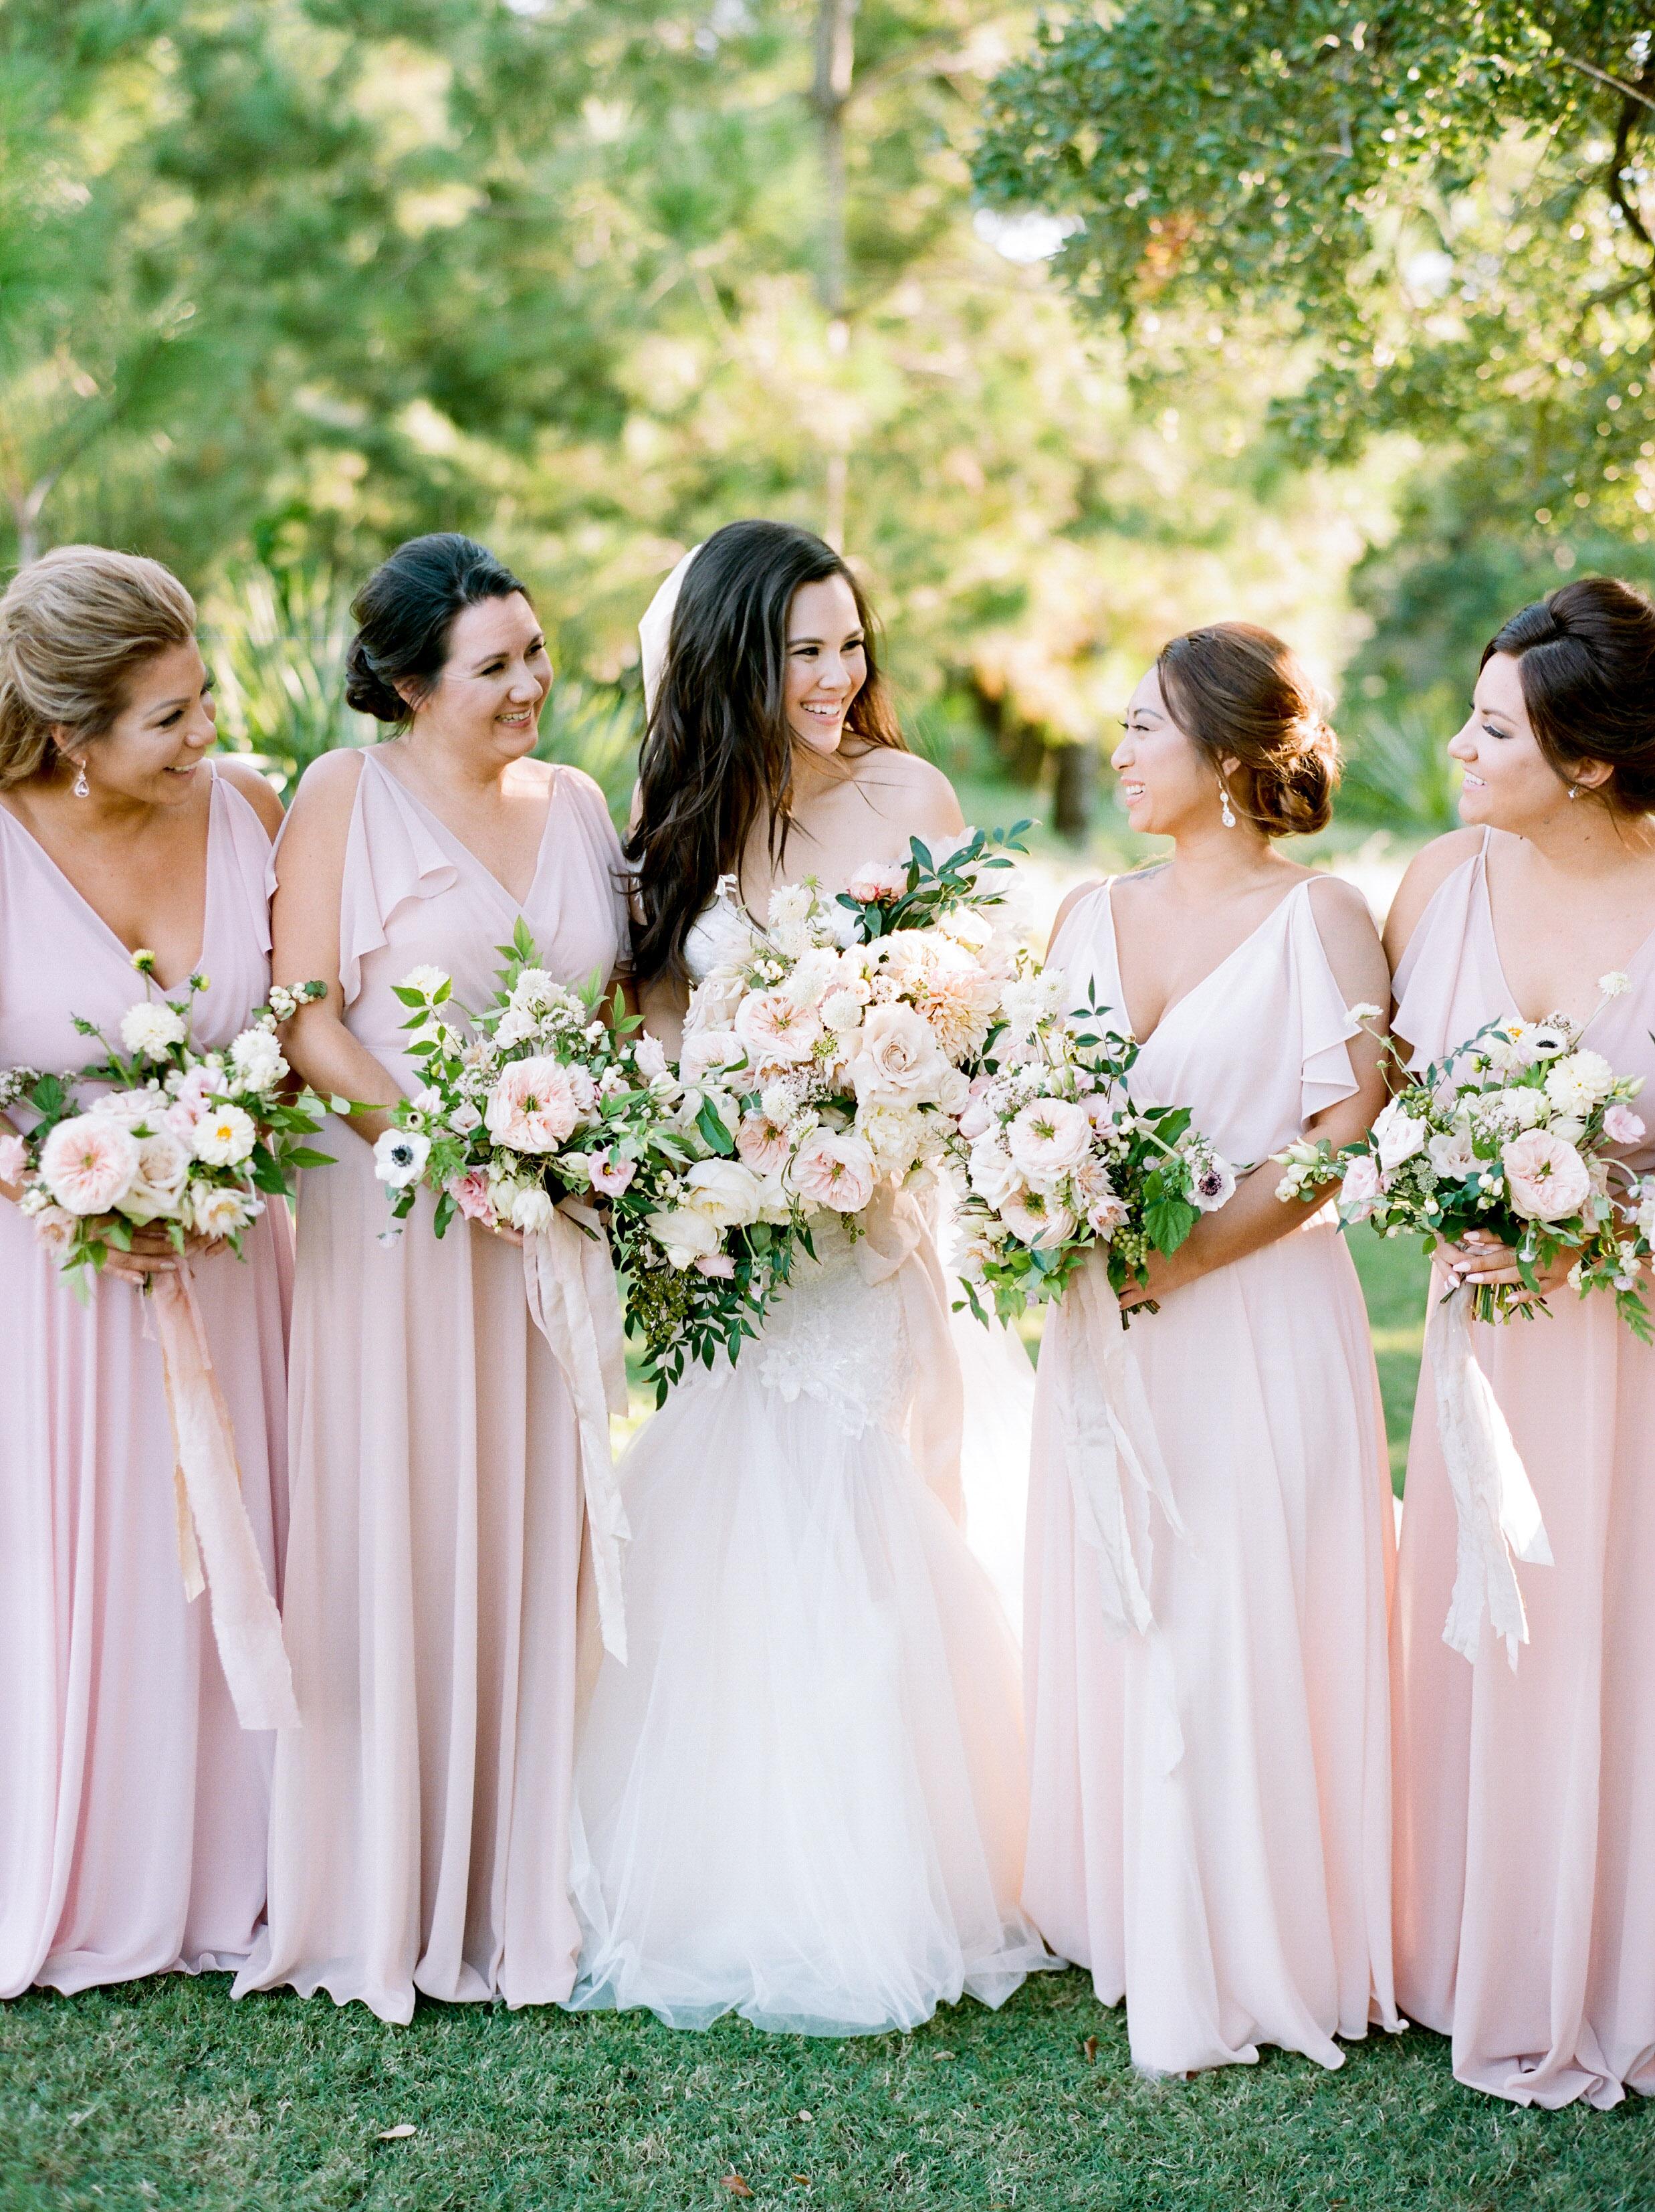 Martha-Stewart-Wedding-Dana-Fernandez-Photography-Josh-Texas-Film-Houston-Wedding-Fine-Art-Photographer-McGovern-Centennial-Gardens-Top-Best-176.jpg